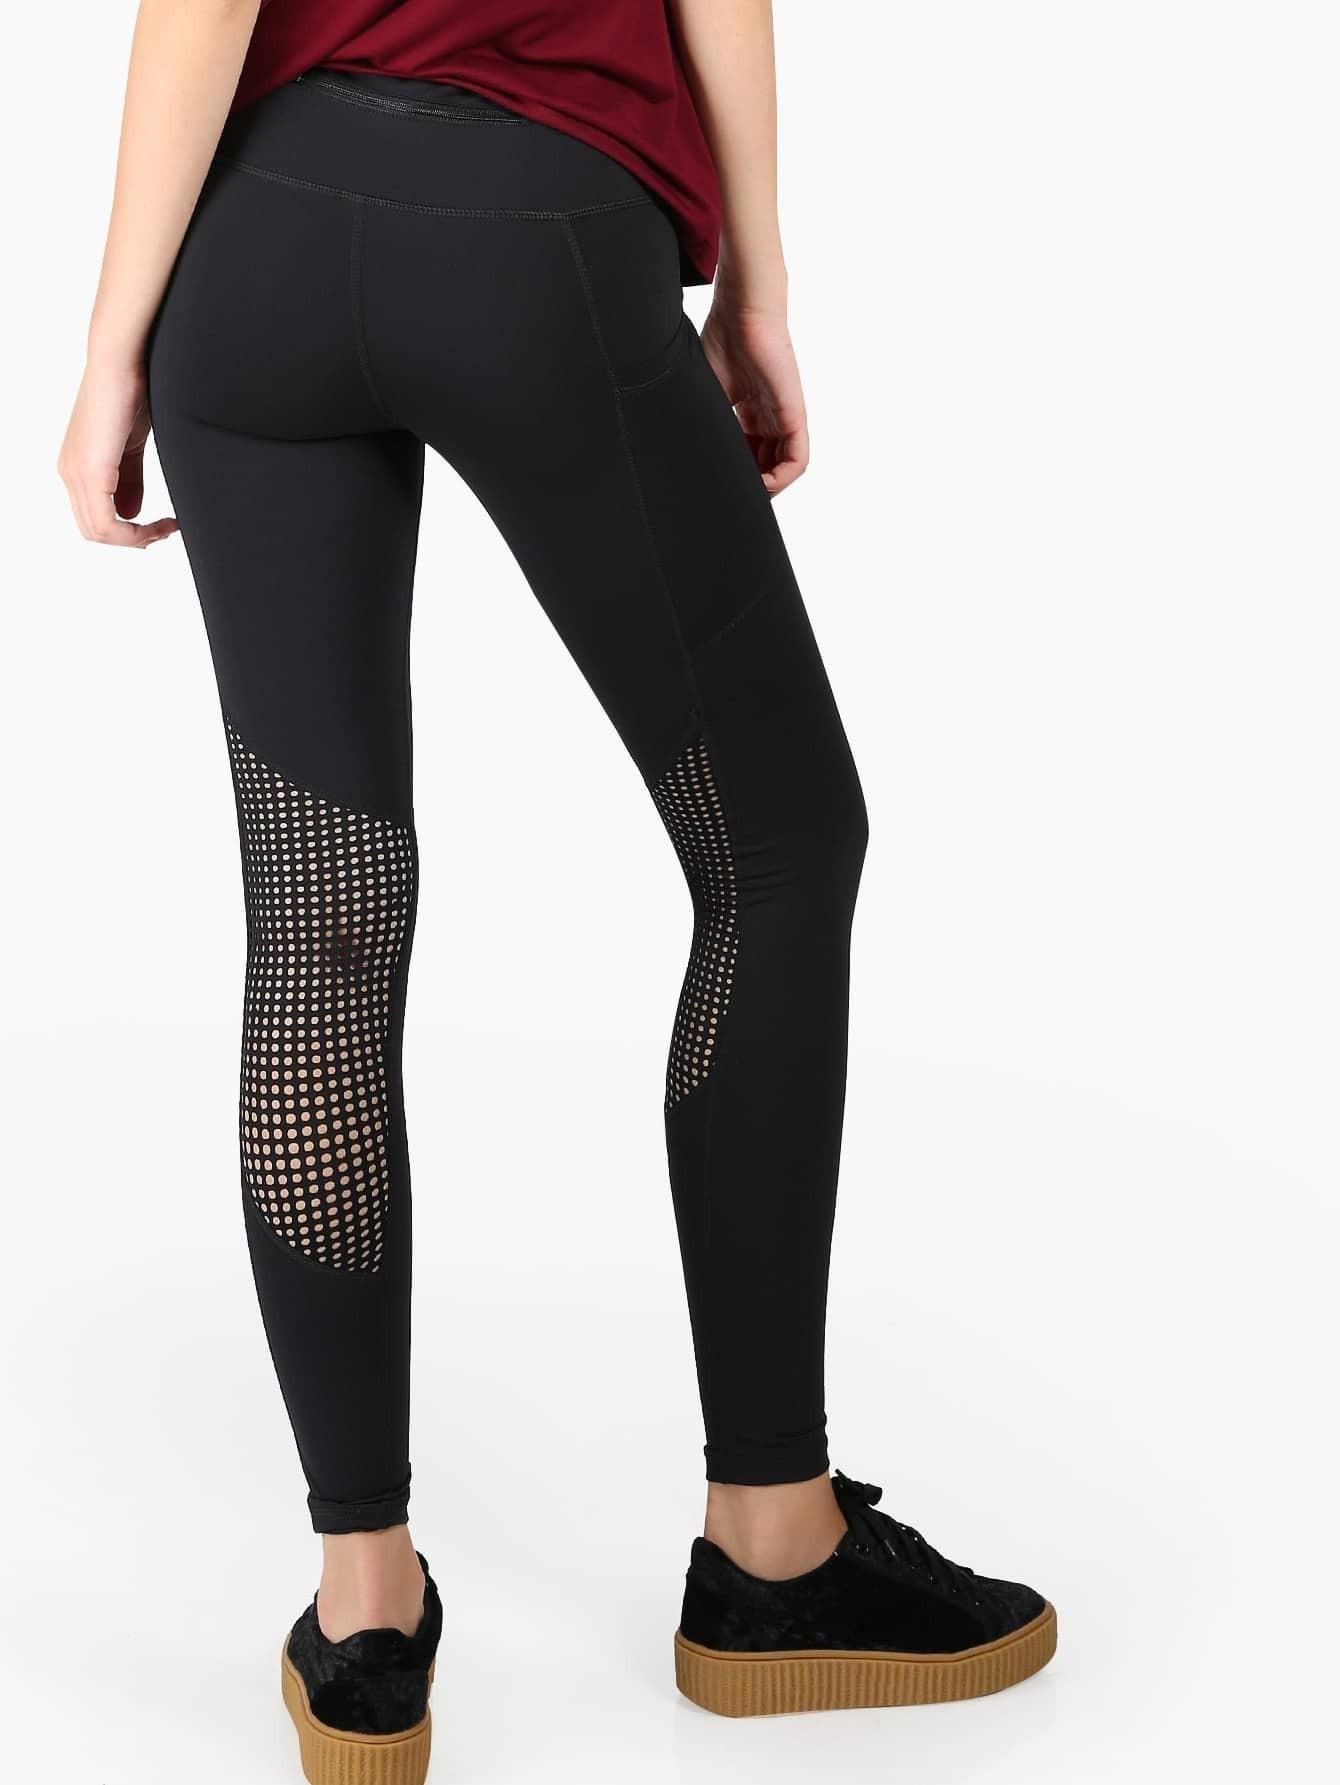 Perforated Mesh Activewear Leggings mmclegging-ap1561-black